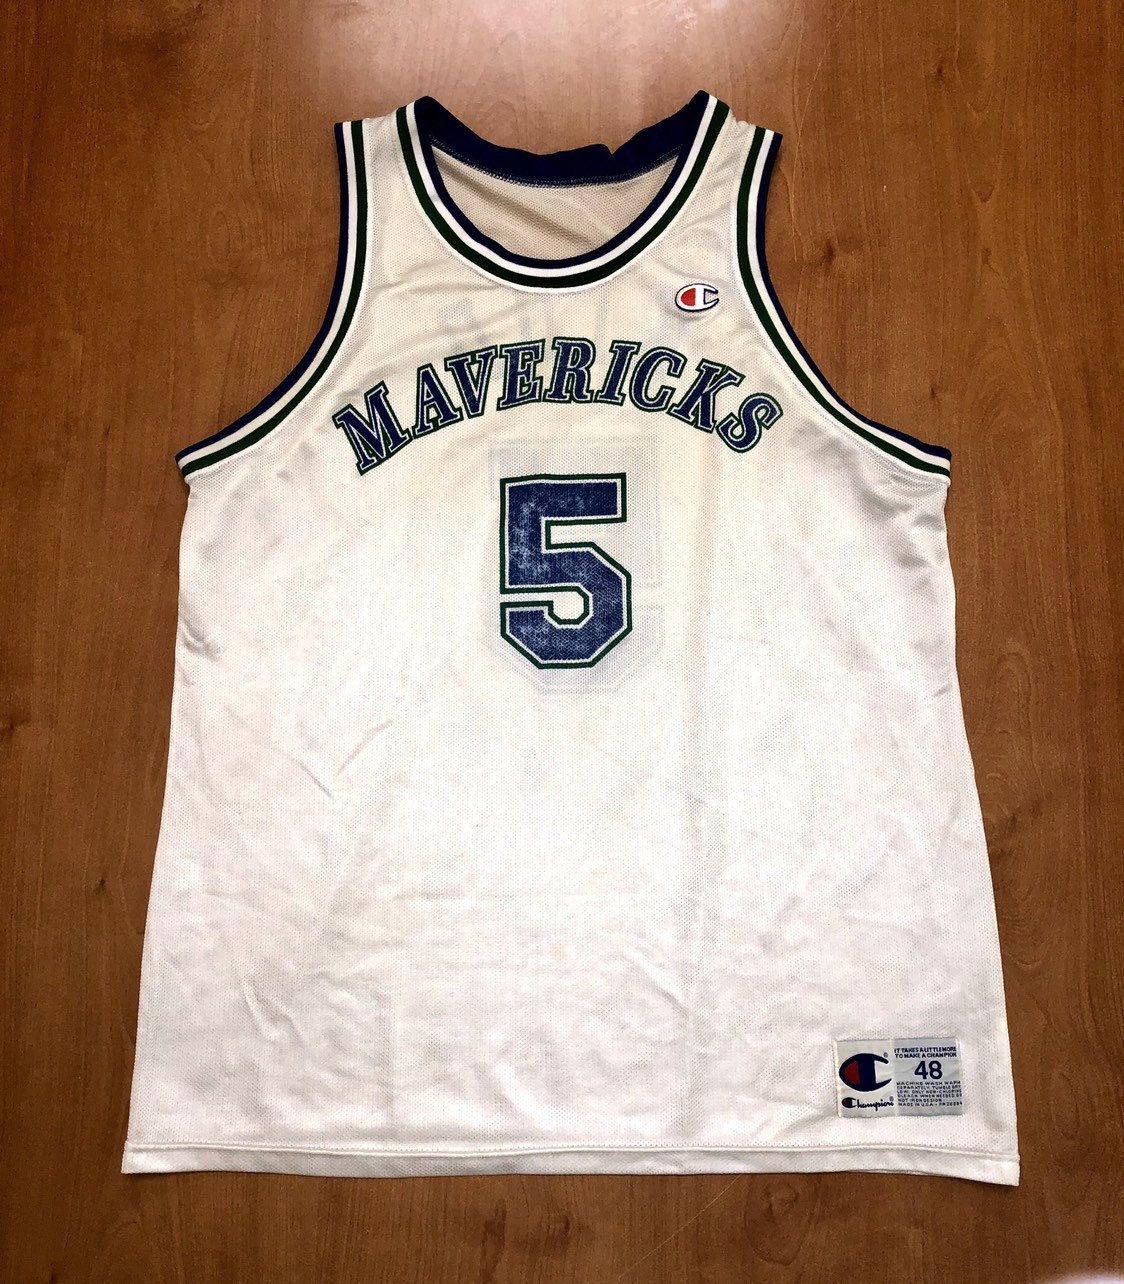 de6799046844 Vintage 1995 - 1998 Jason Kidd Dallas Mavericks Champion Jersey Size 48 hat shirt  mavs rolando blackman cedric ceballos berkeley nba finals by ...